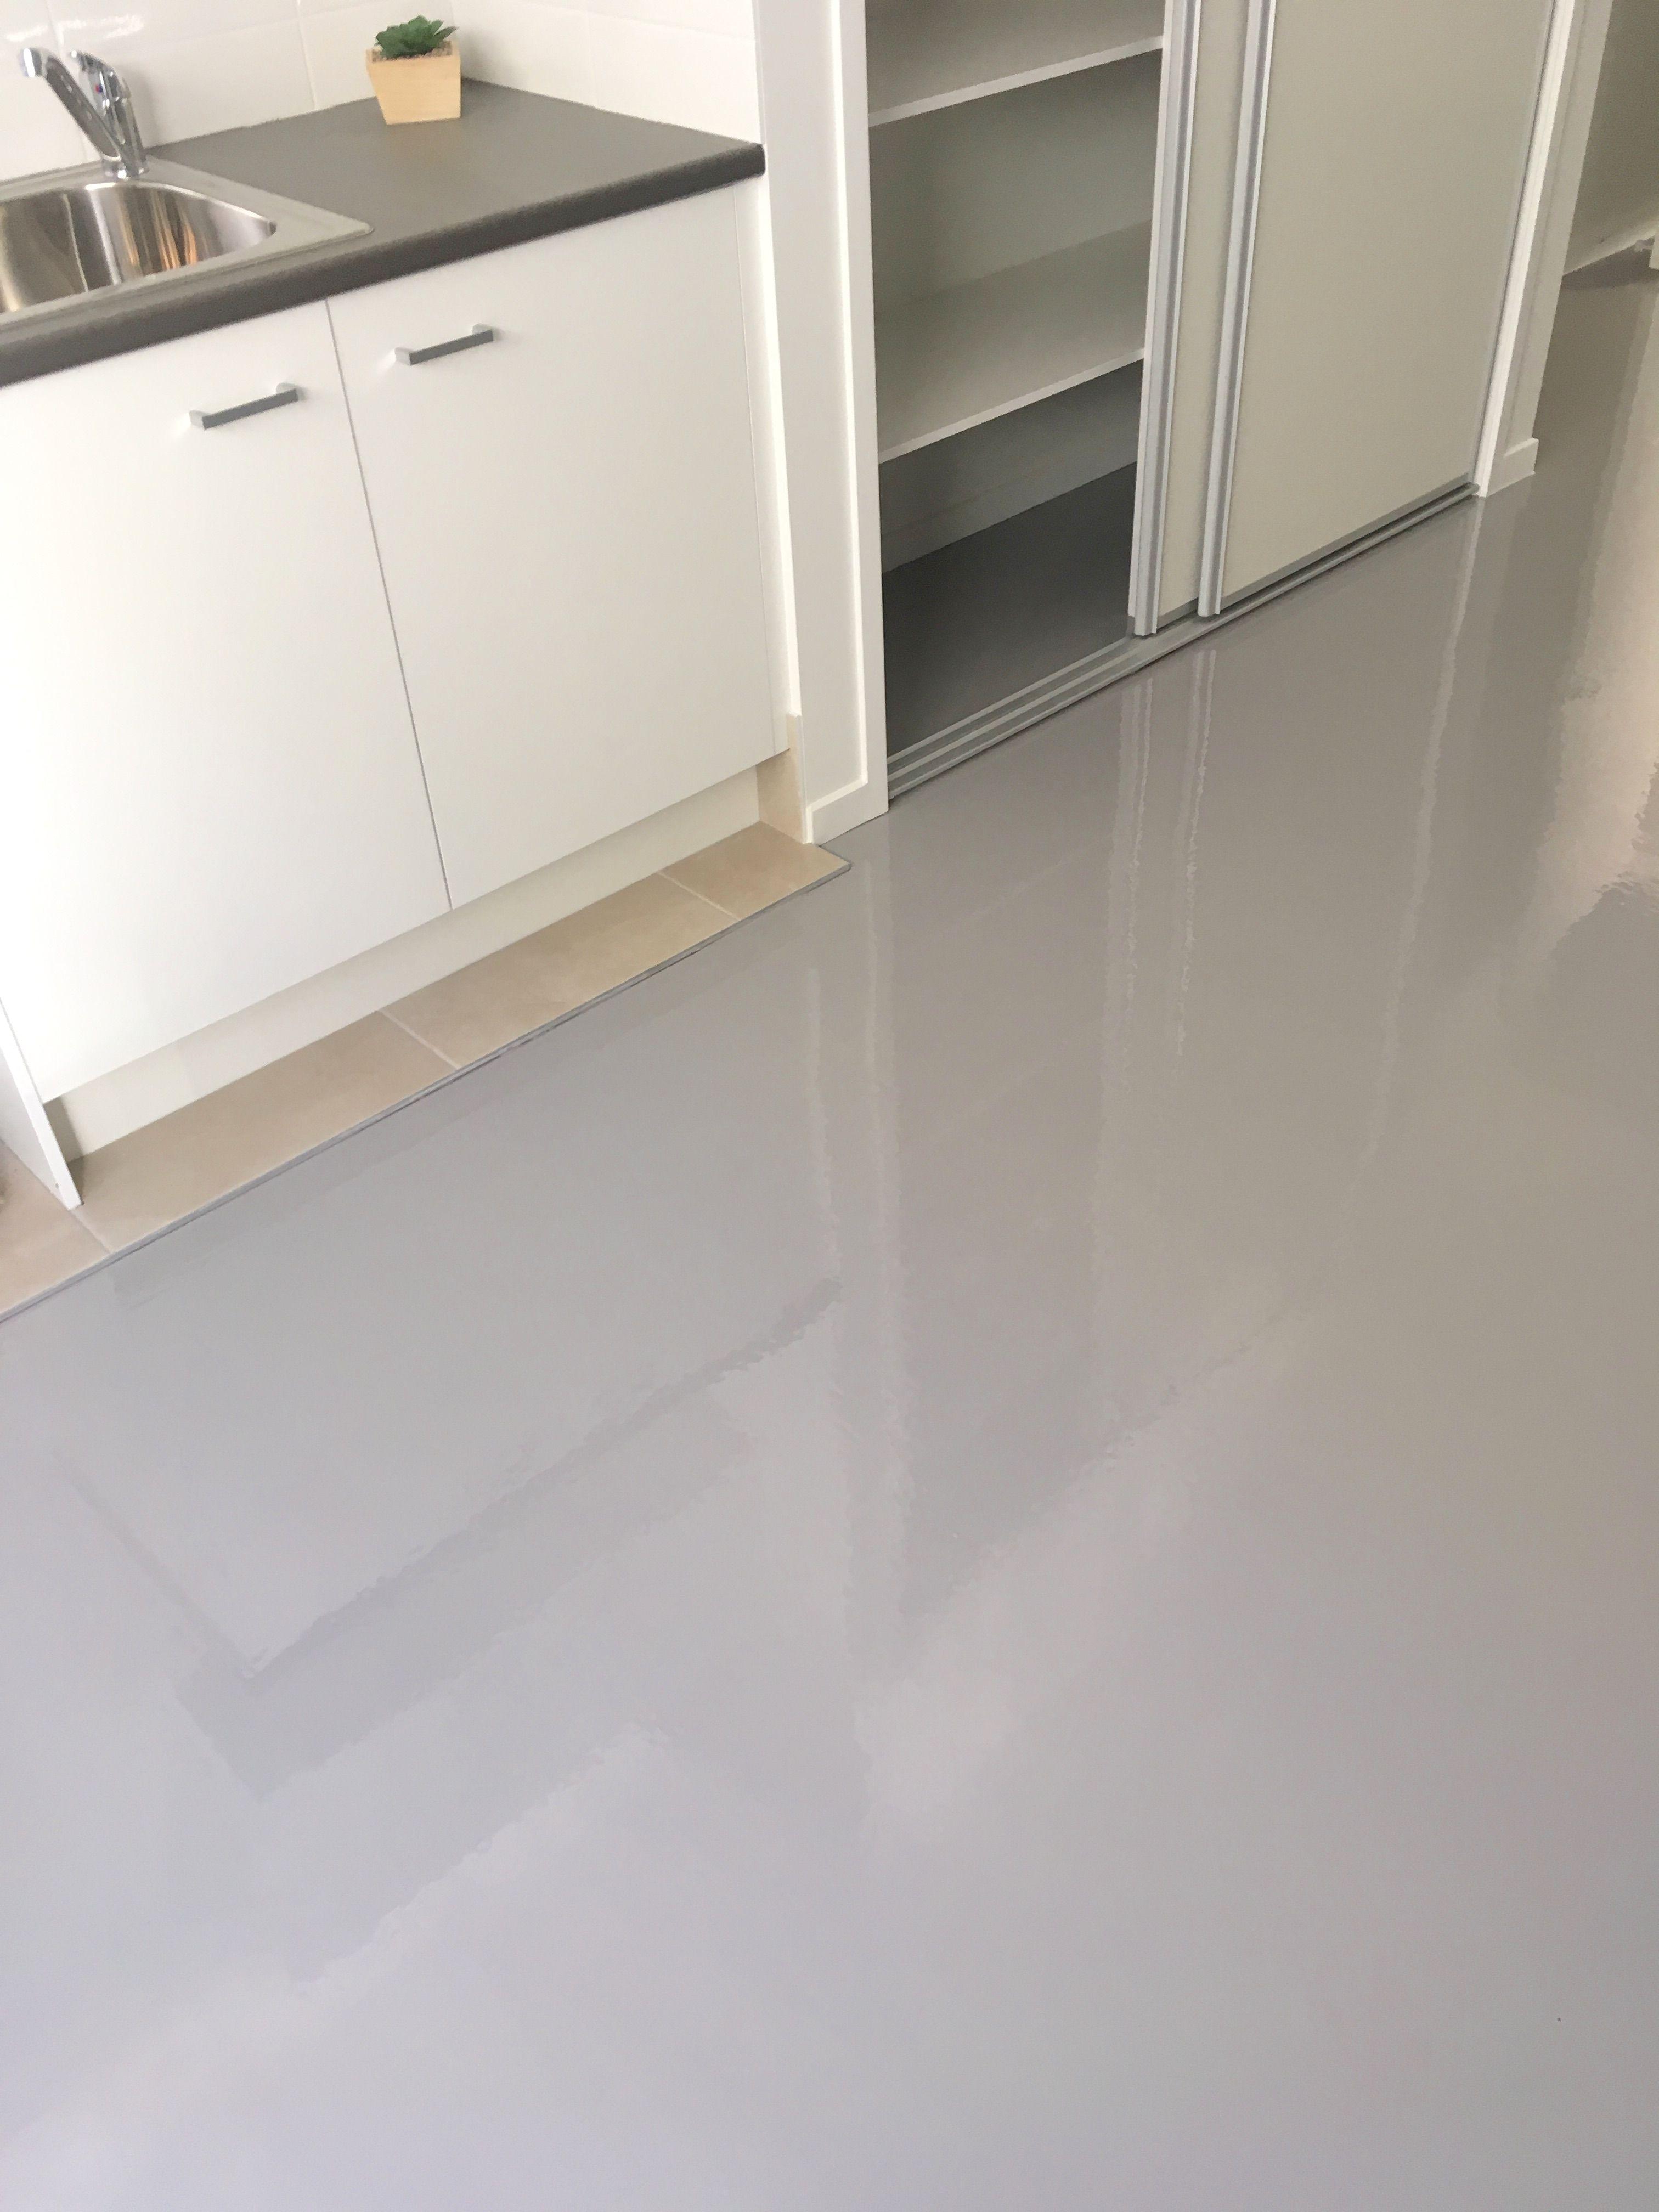 Moffat Beach epoxy flooring by The Garage Floor Co